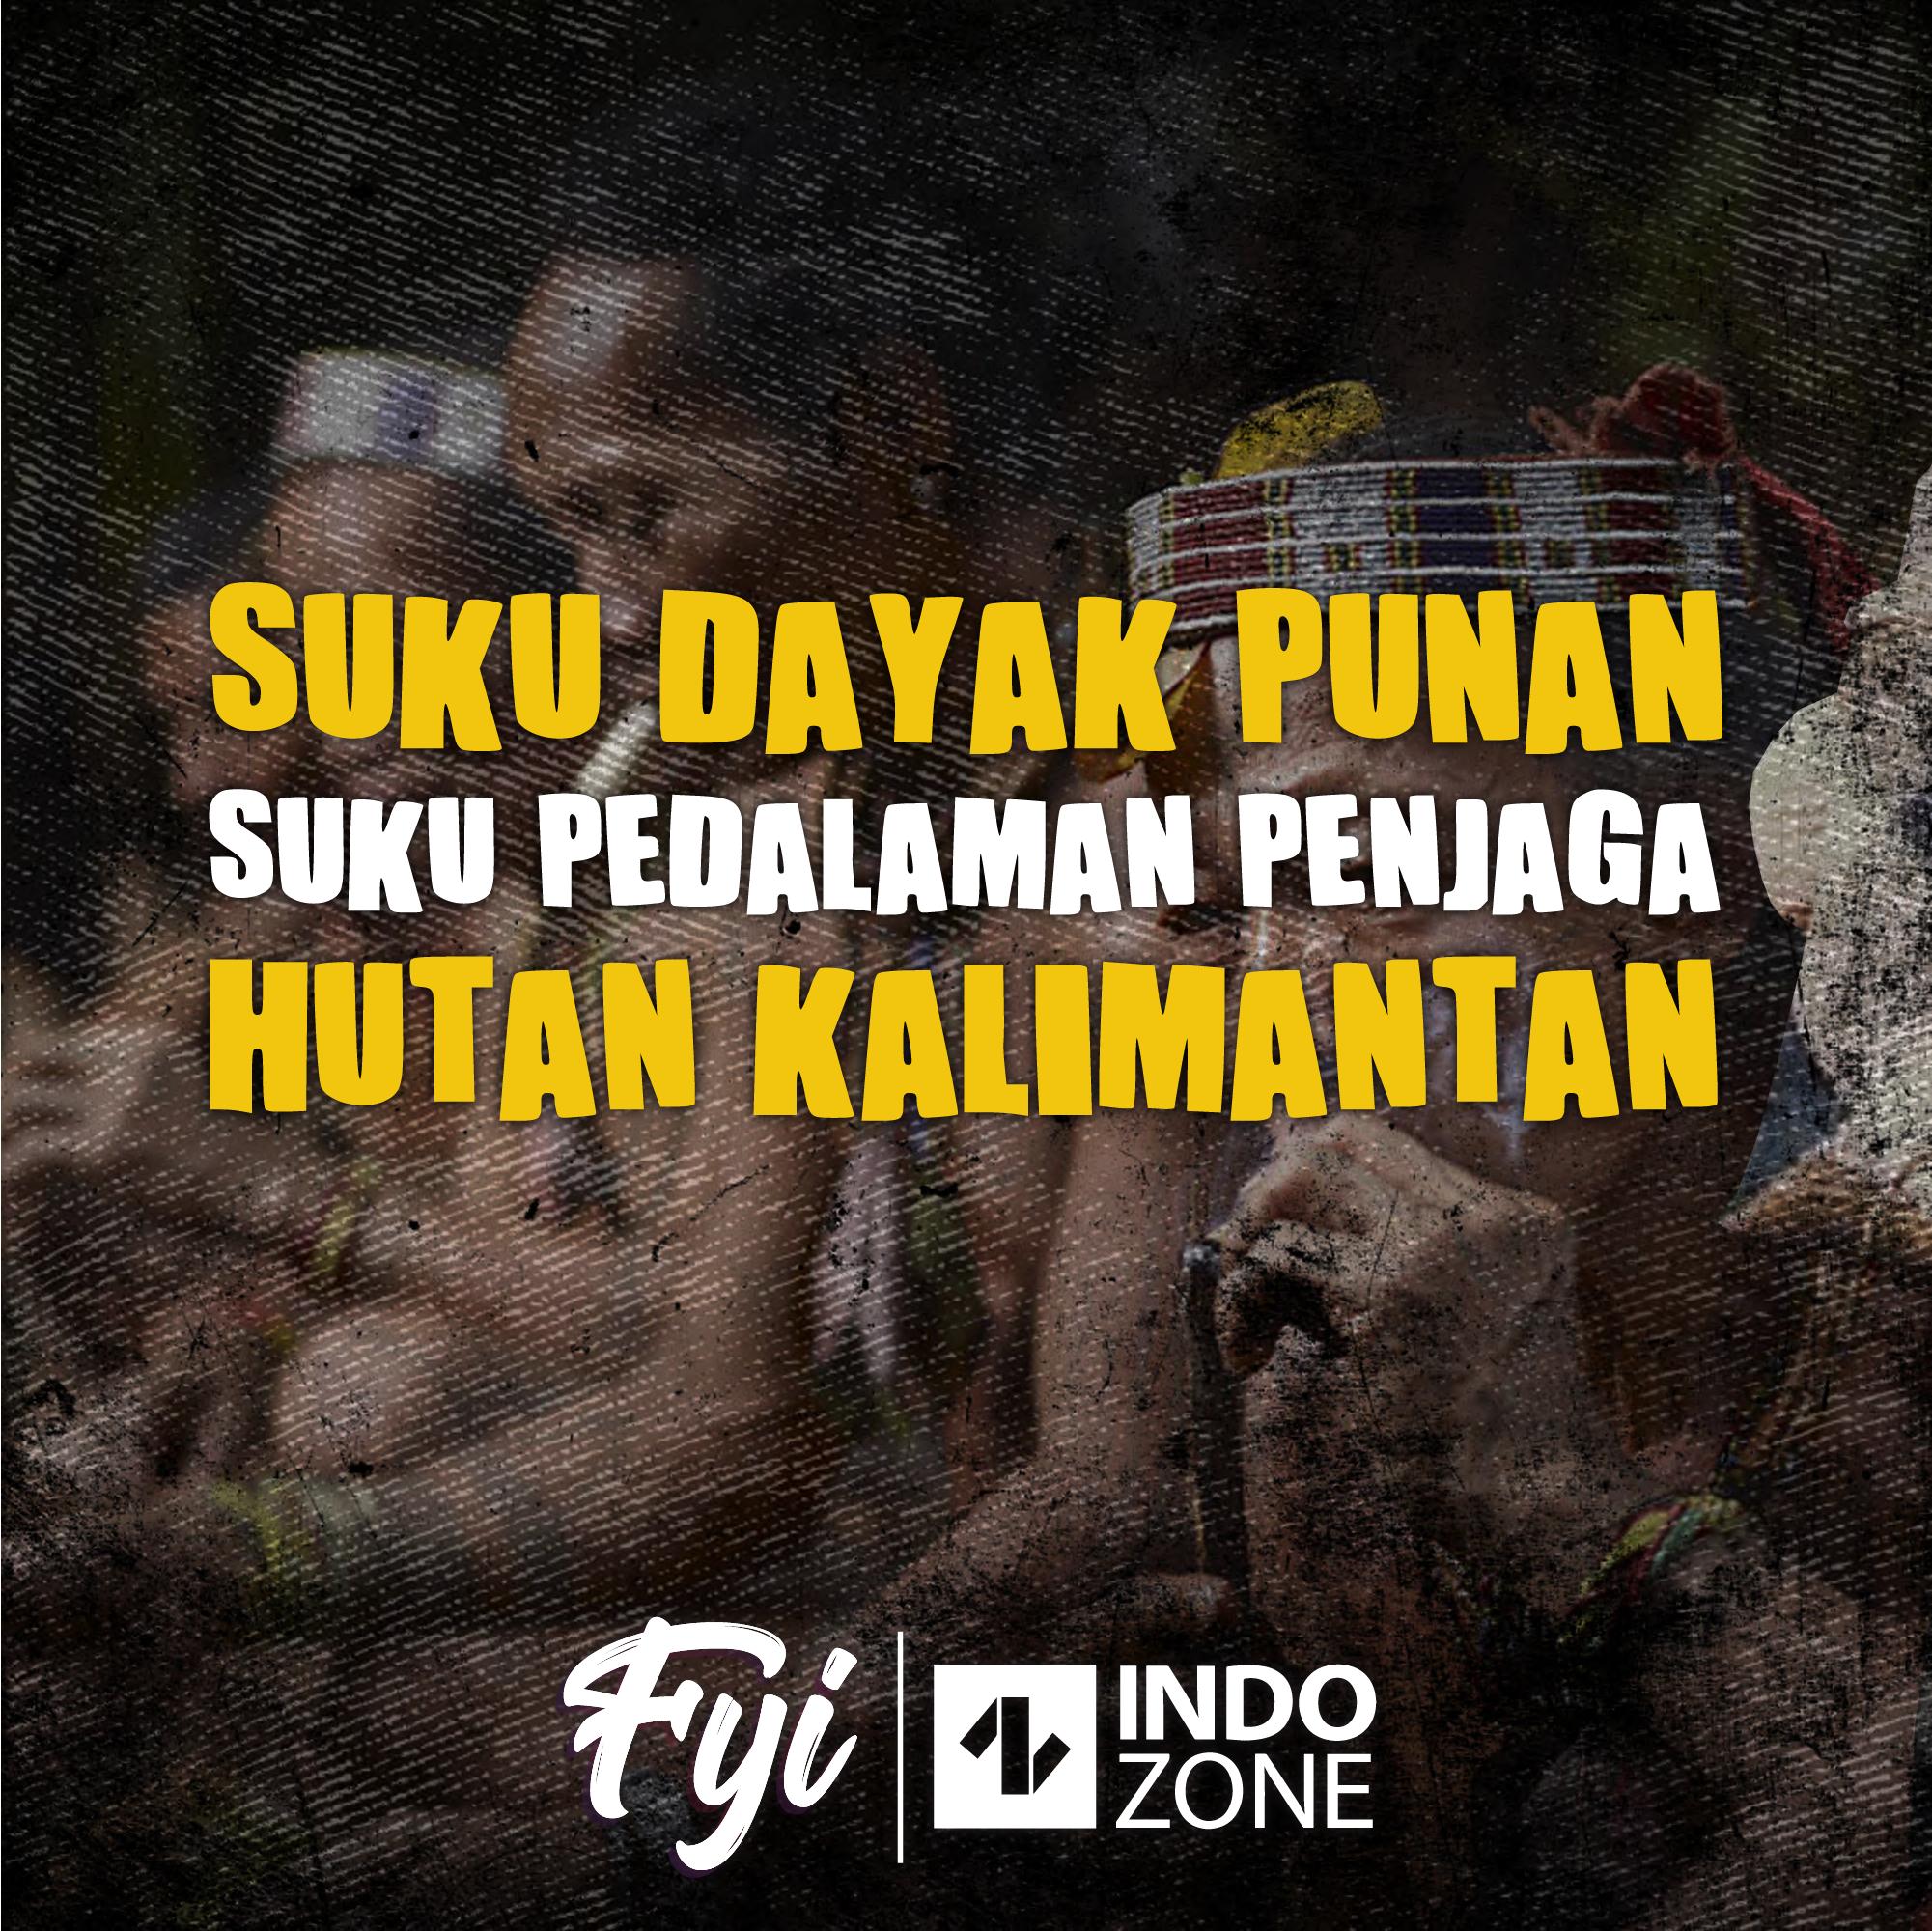 Suku Dayak Punan, Suku Pedalaman Penjaga Hutan Kalimantan